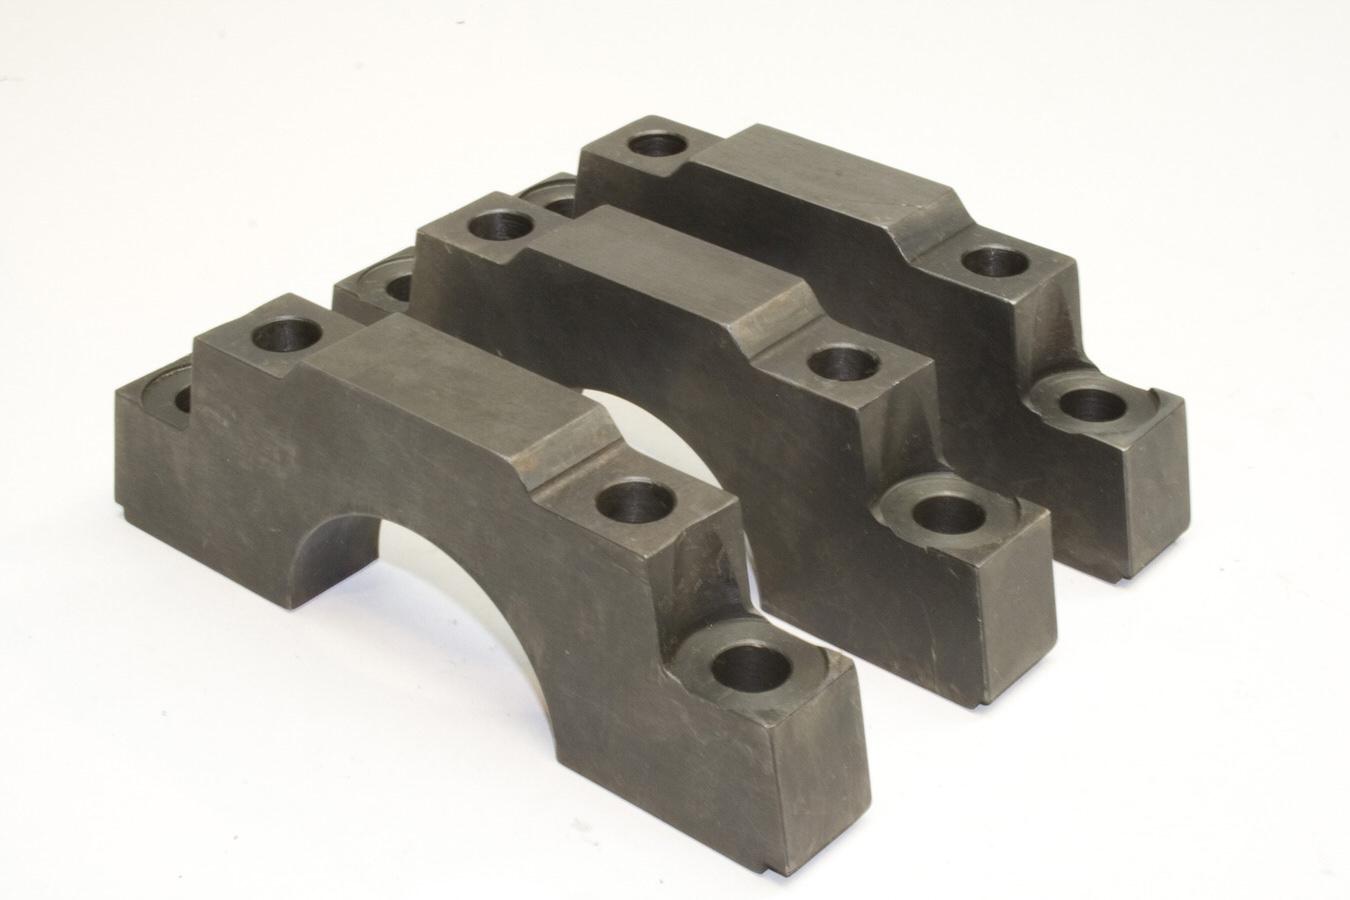 PRW Industries 1735001 Main Cap, 4-Bolt, Center Caps, Straight Bolts, Steel, 350 Journal, Small Block Chevy, Kit